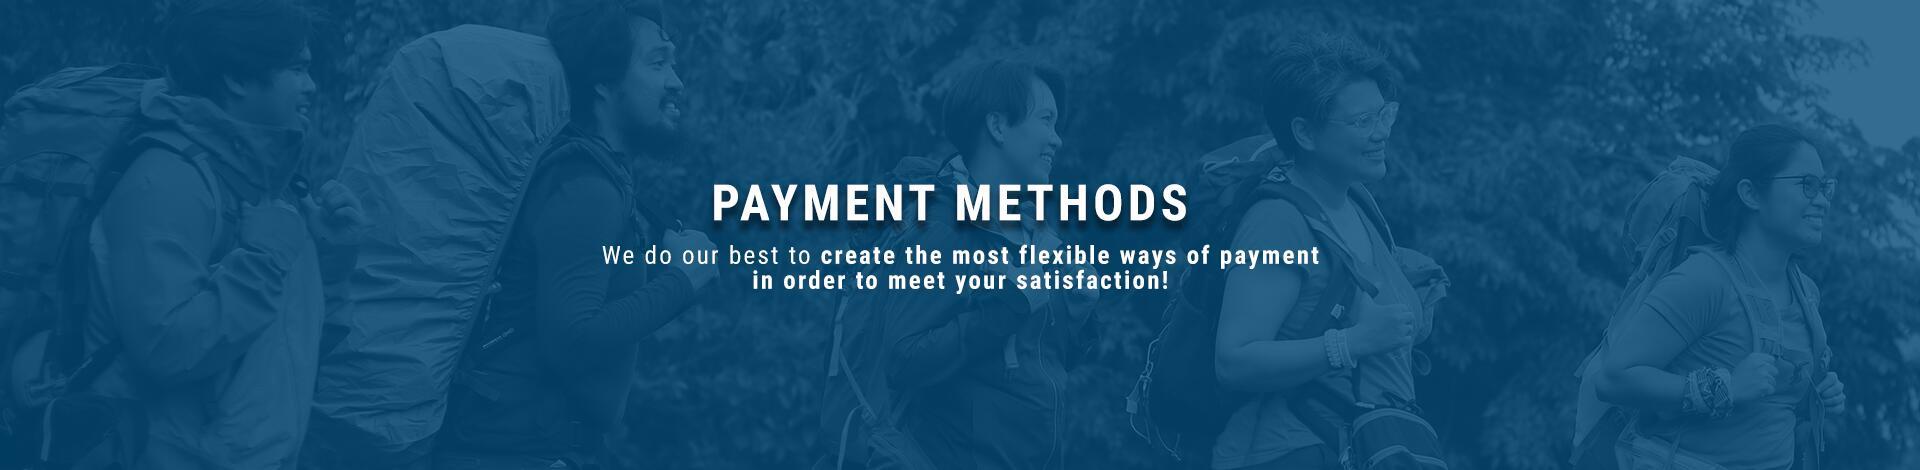 Decathlon Philippines Payment Methods